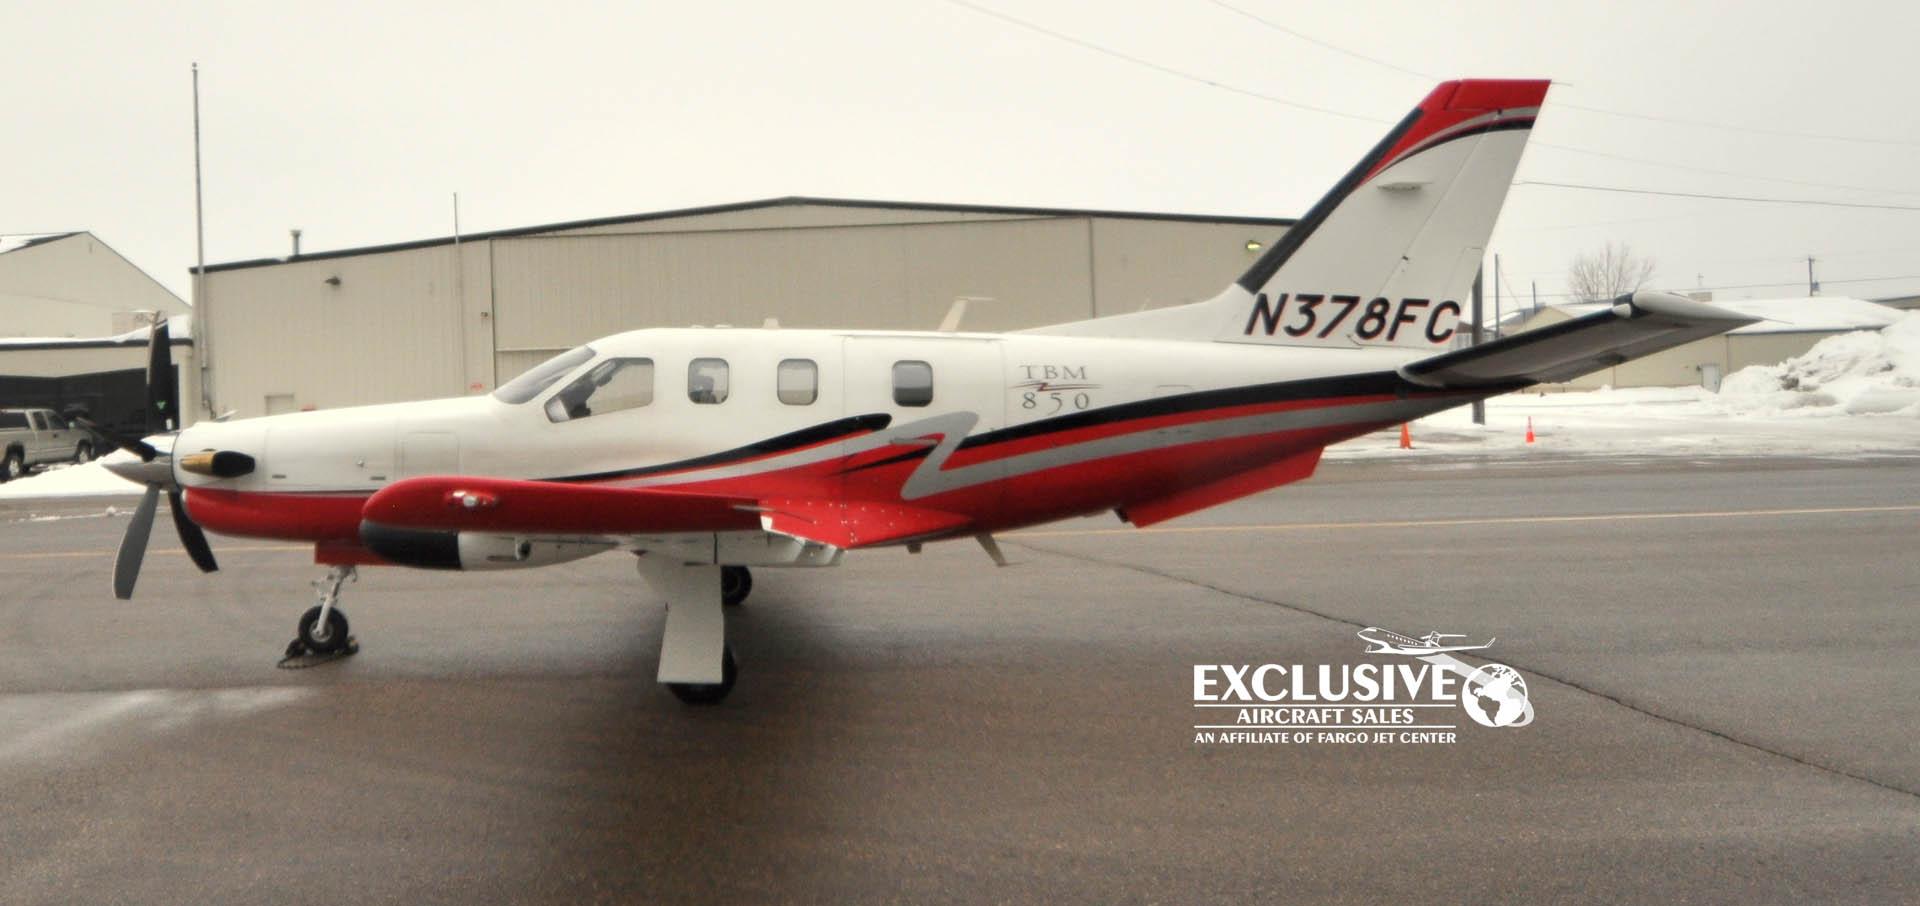 Aircraft Listing - Socata TBM 850 listed for sale